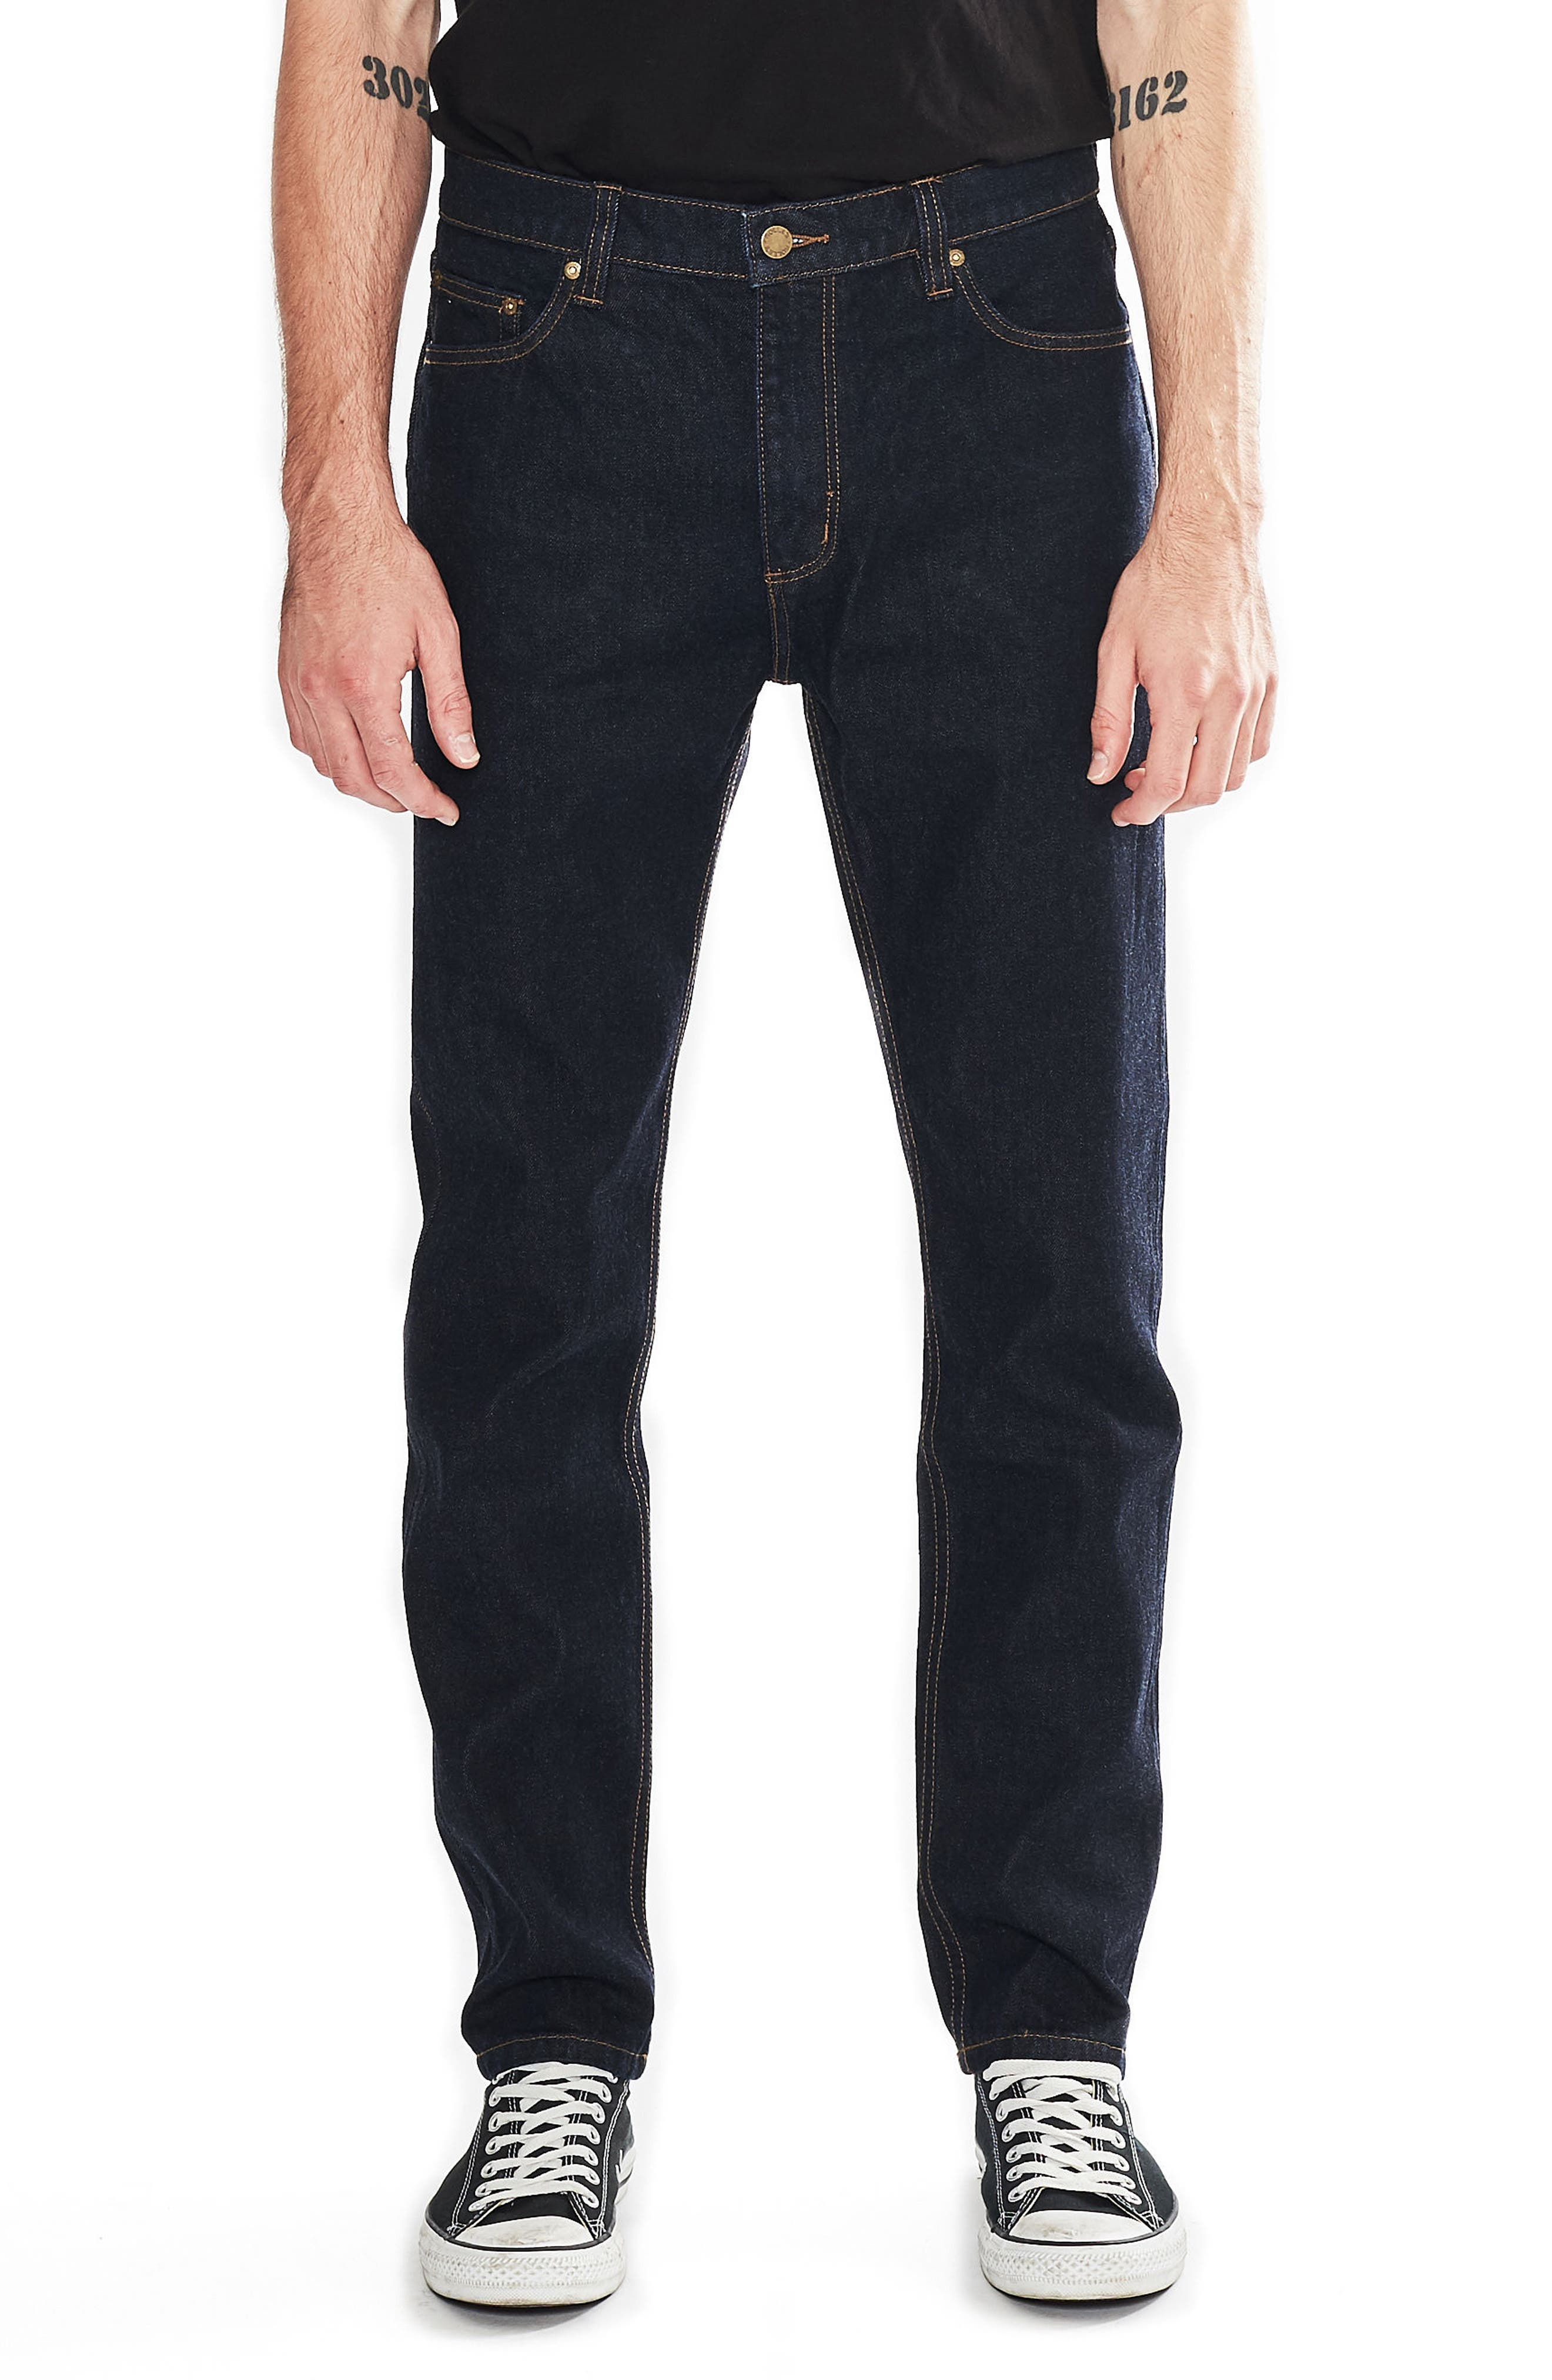 Tim Slims Slim Fit Jeans,                             Main thumbnail 1, color,                             Indigo Raw